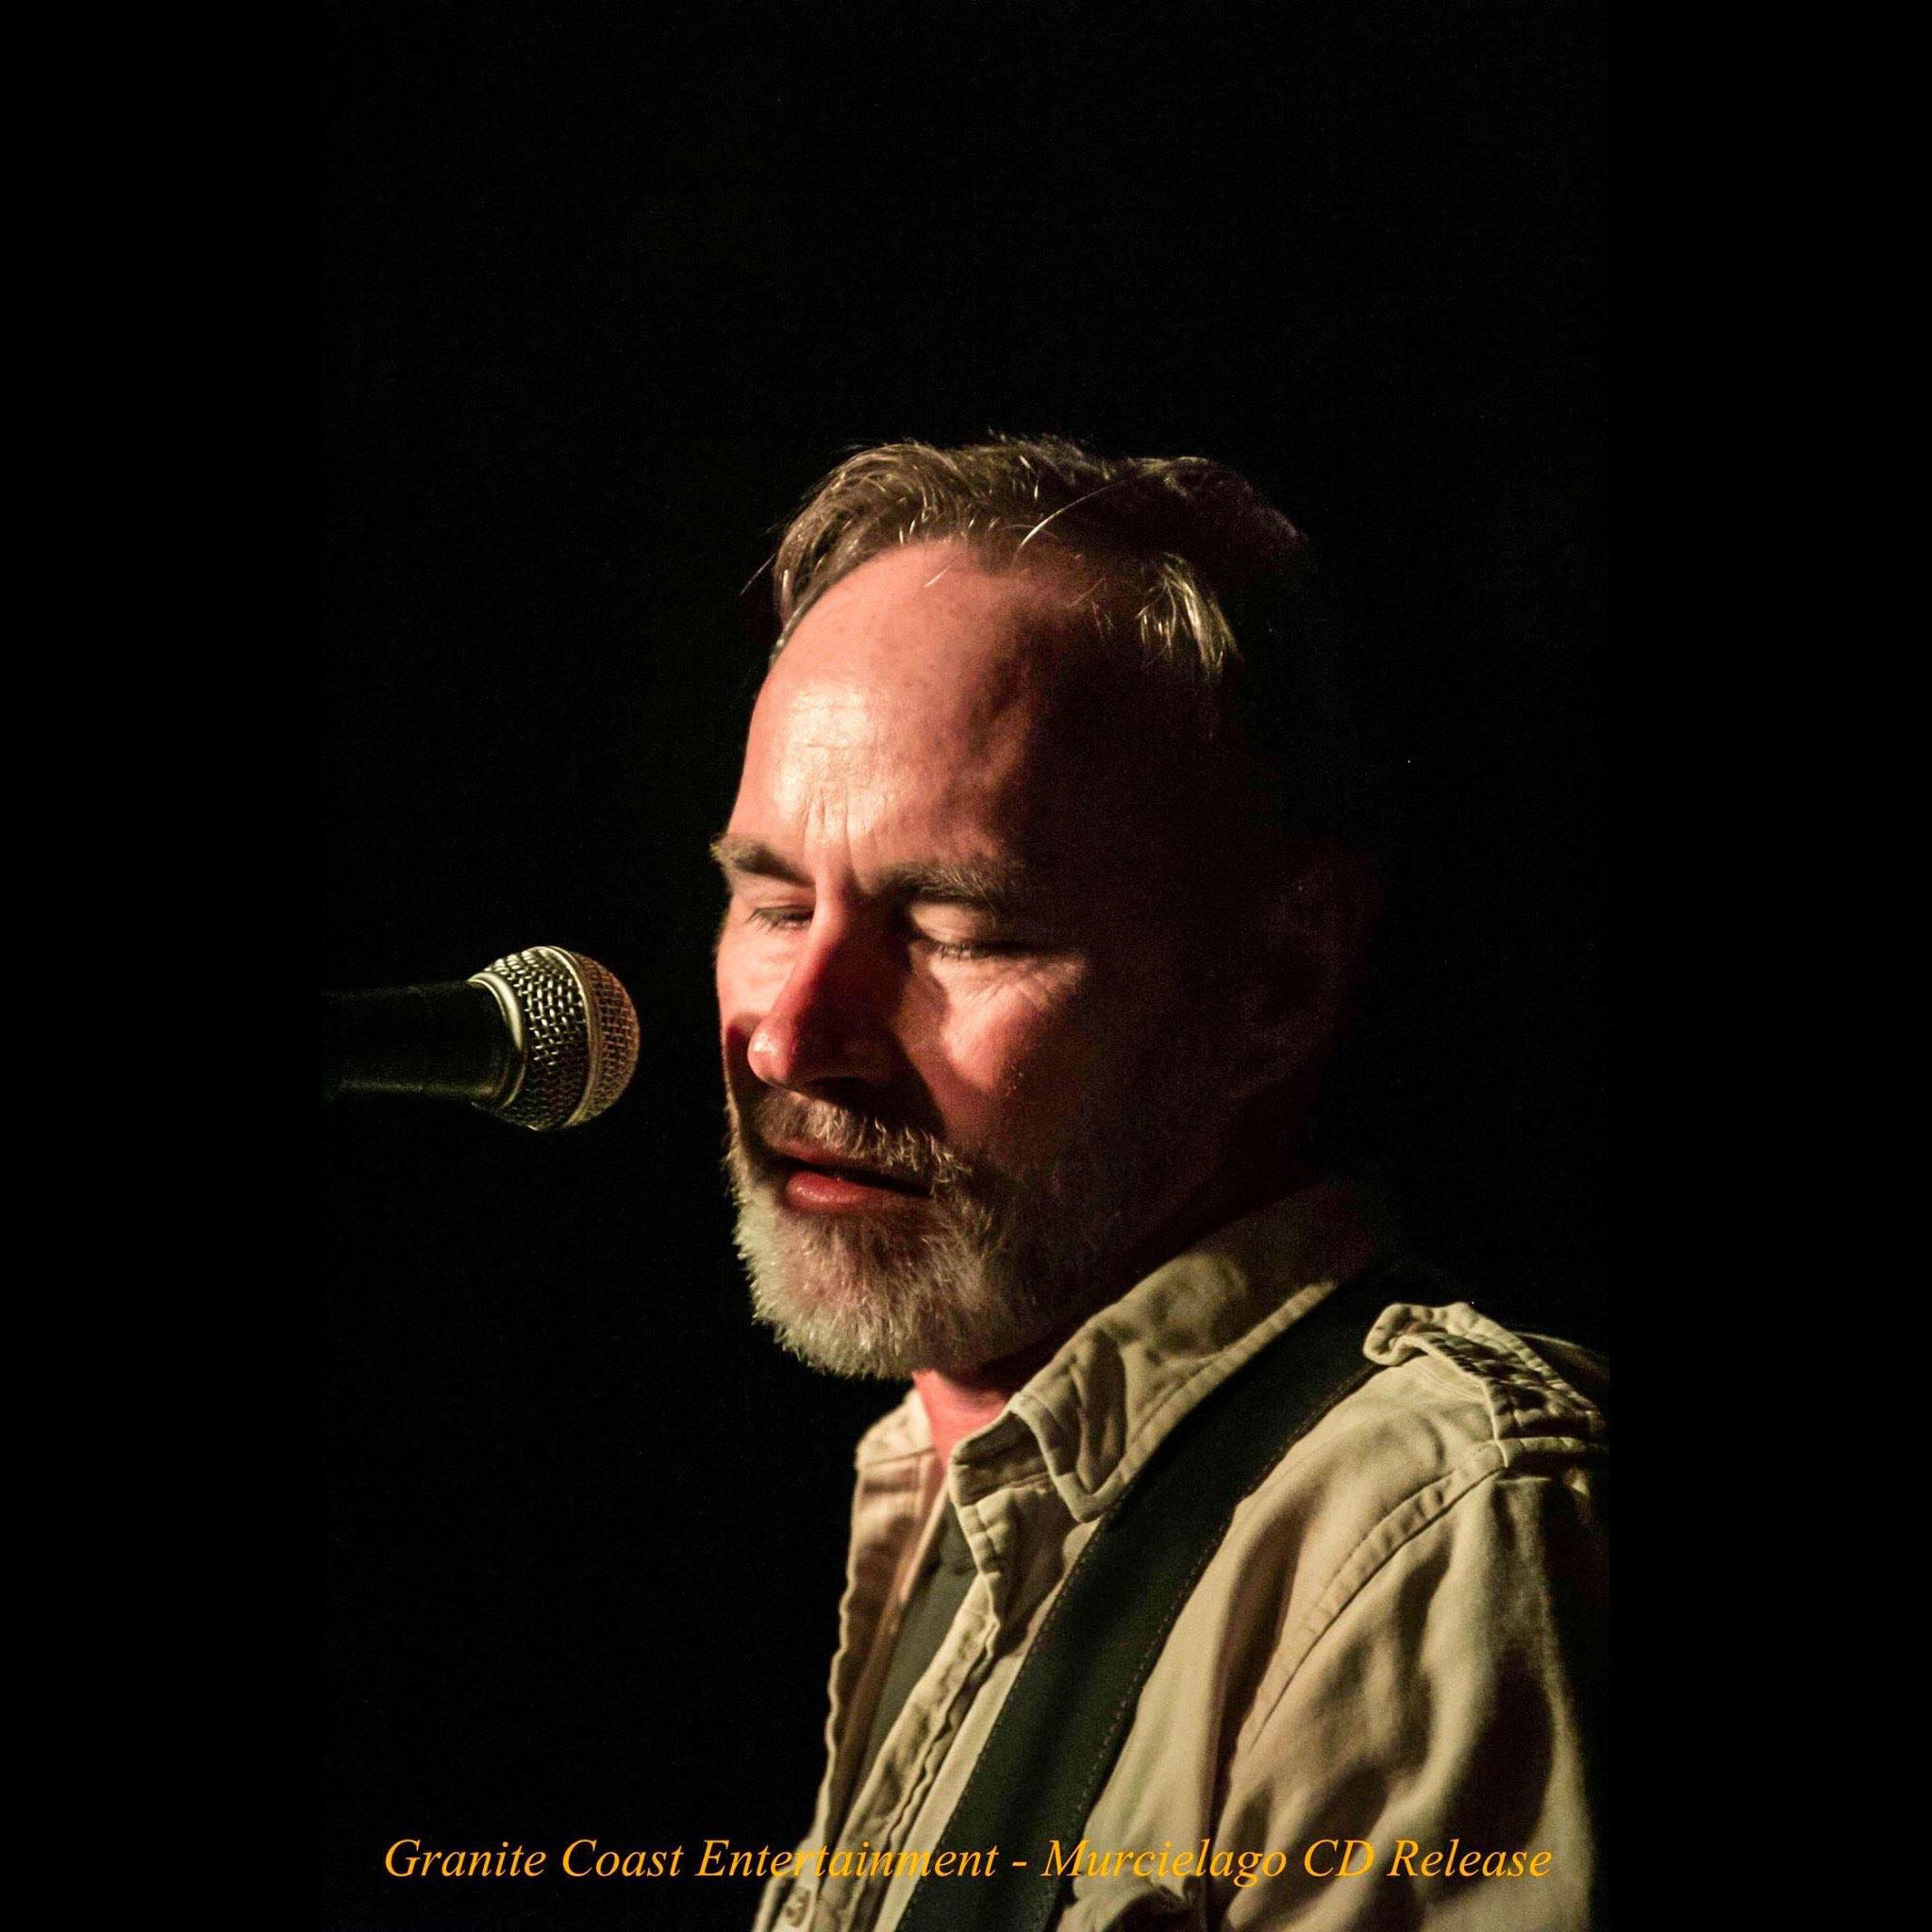 Neil Collins of Murcielago